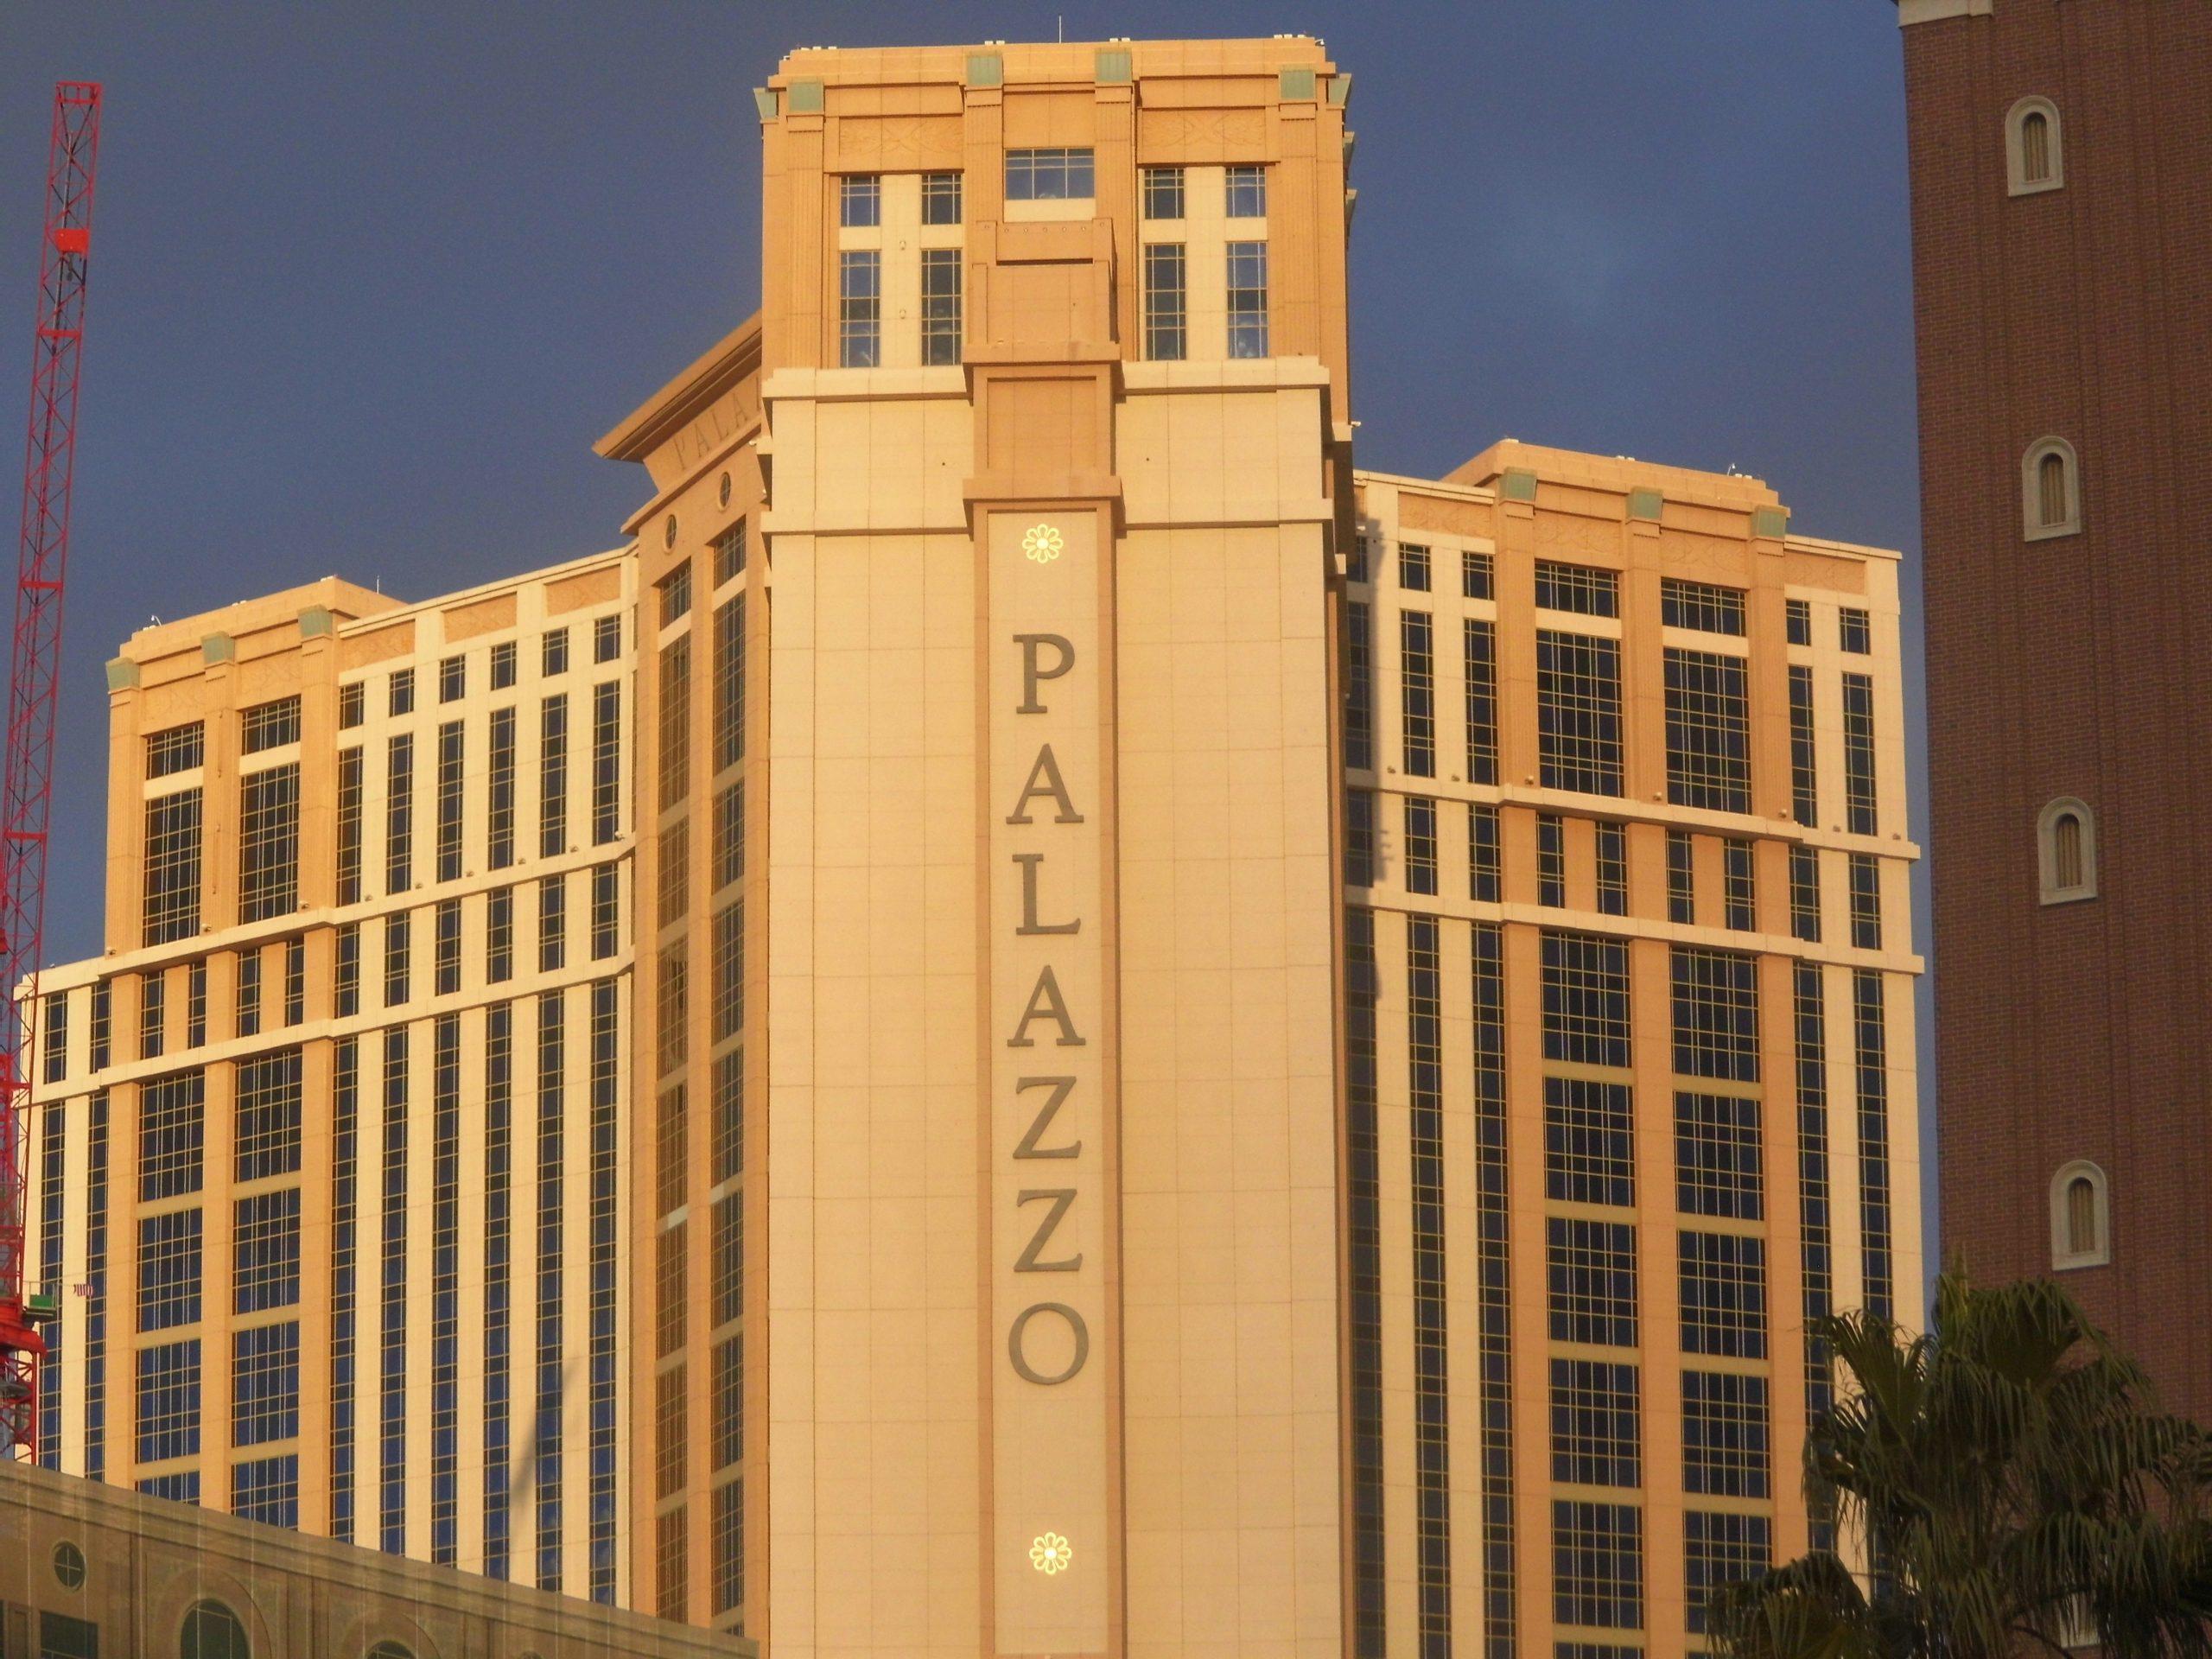 The Palazzo Las Vegas, The Palazzo 2019, Palazzo Hotel and Casino Las Vegas, Palazzo 2019